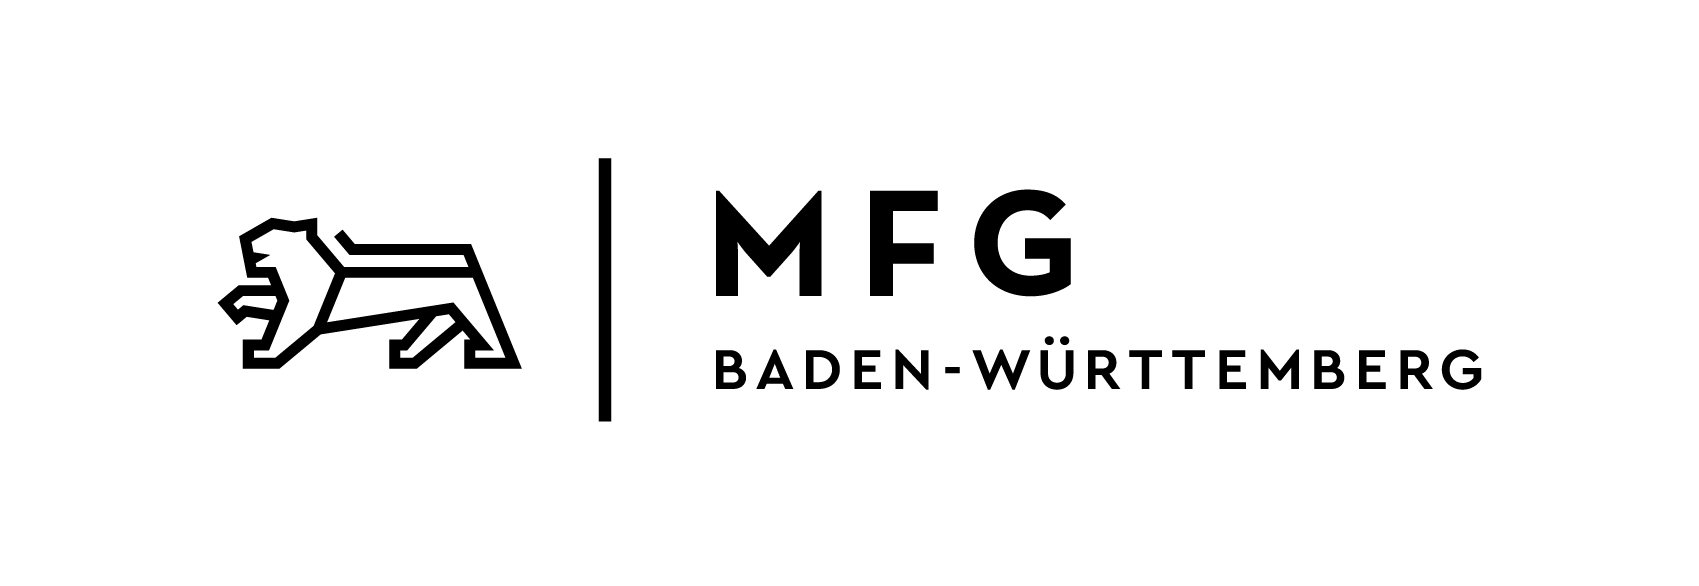 171211_MFG_Logo_Allgemein_RGB